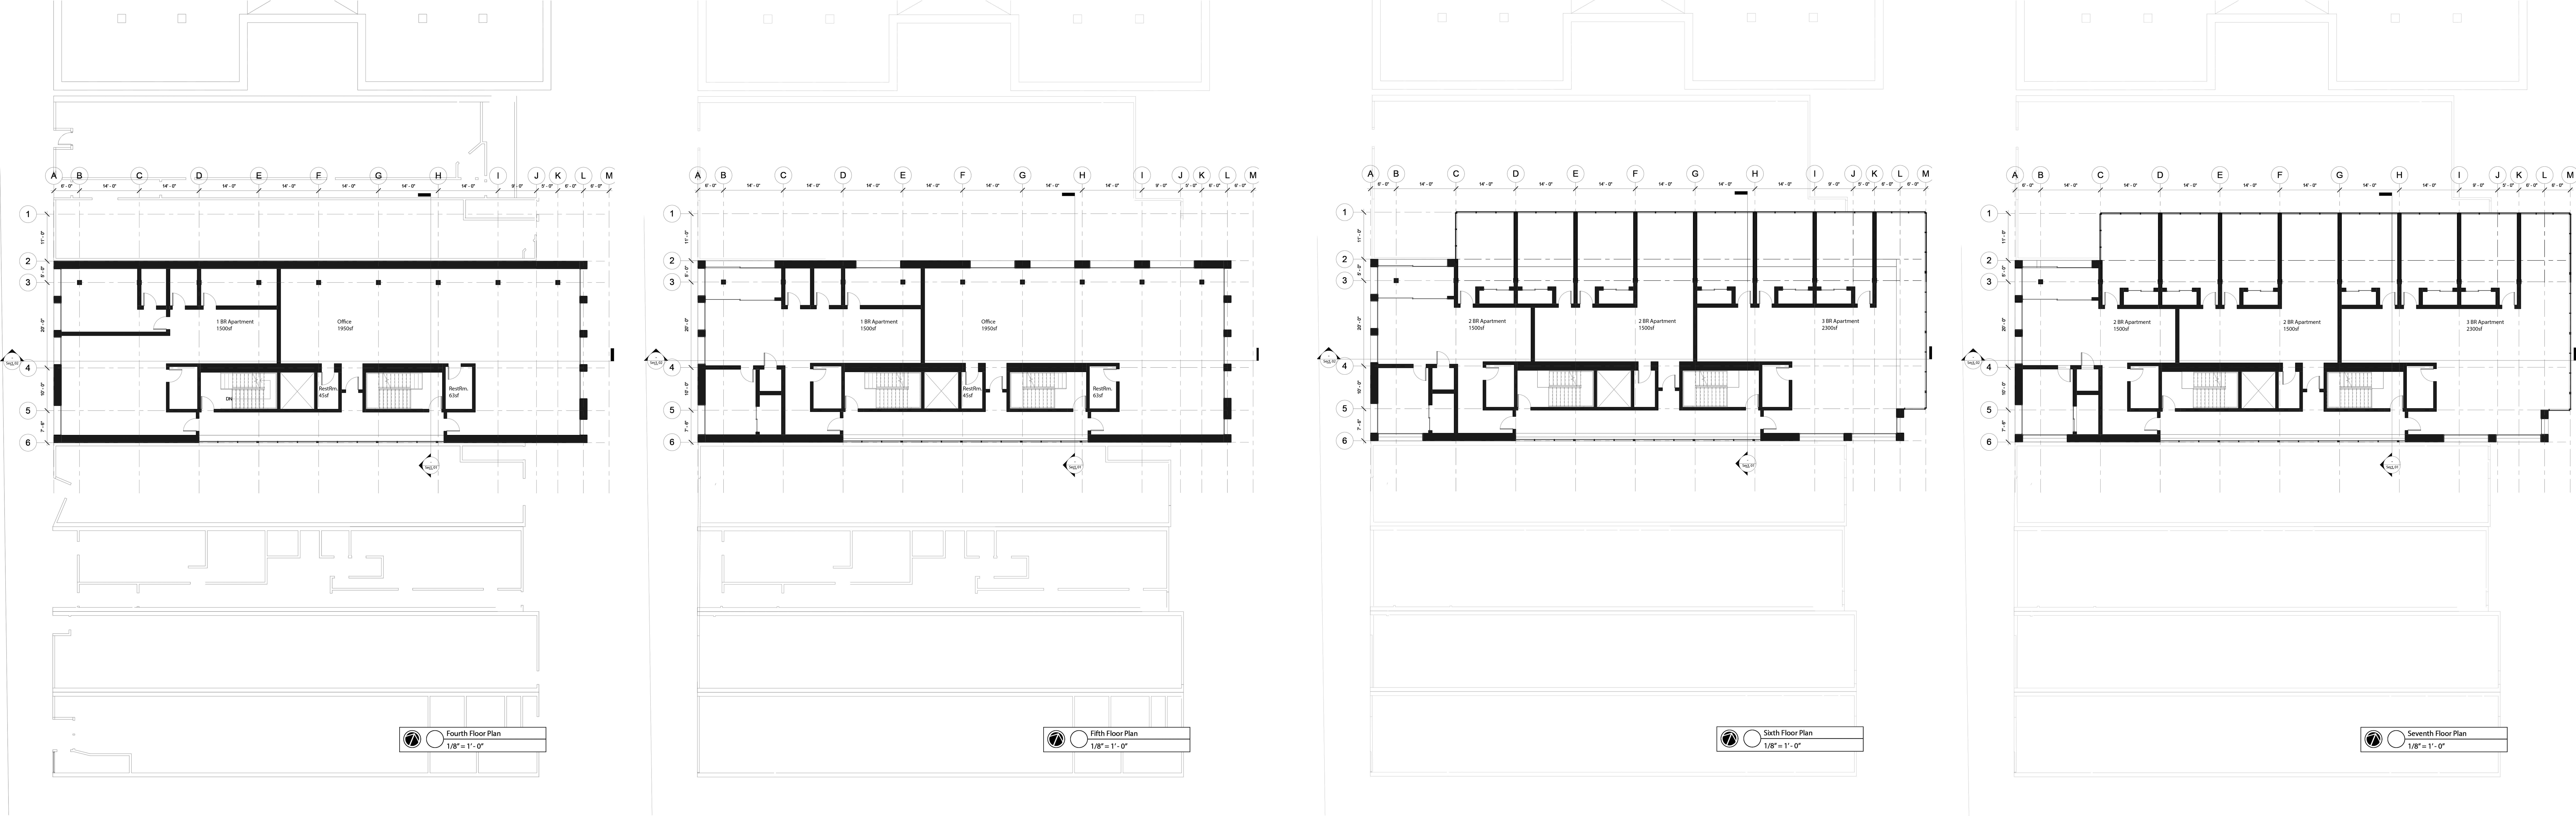 4th floor - 7th floor plans